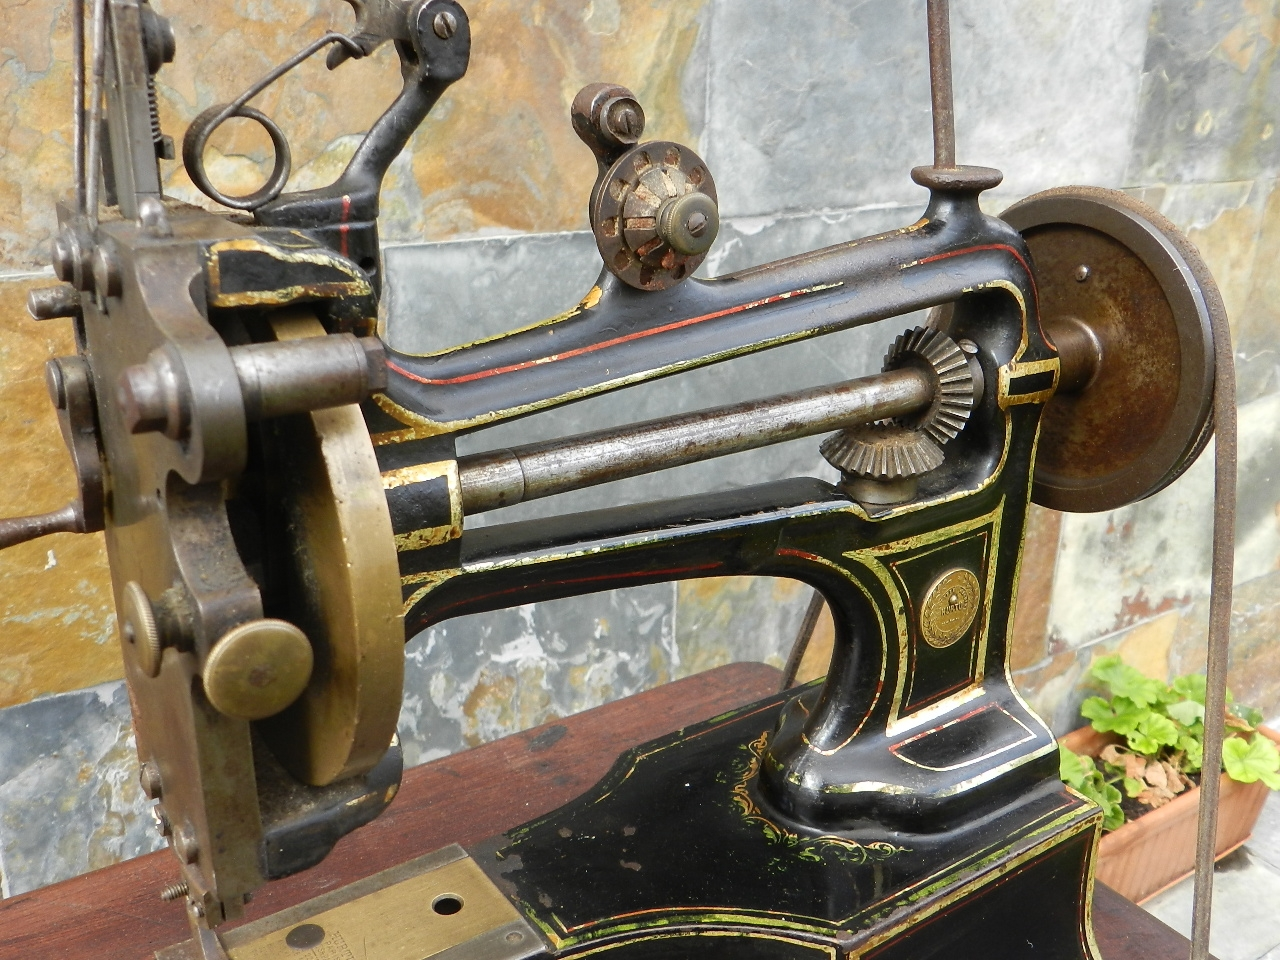 Imagen MAQUINA DE COSER HURTU AÑO 1890 39797